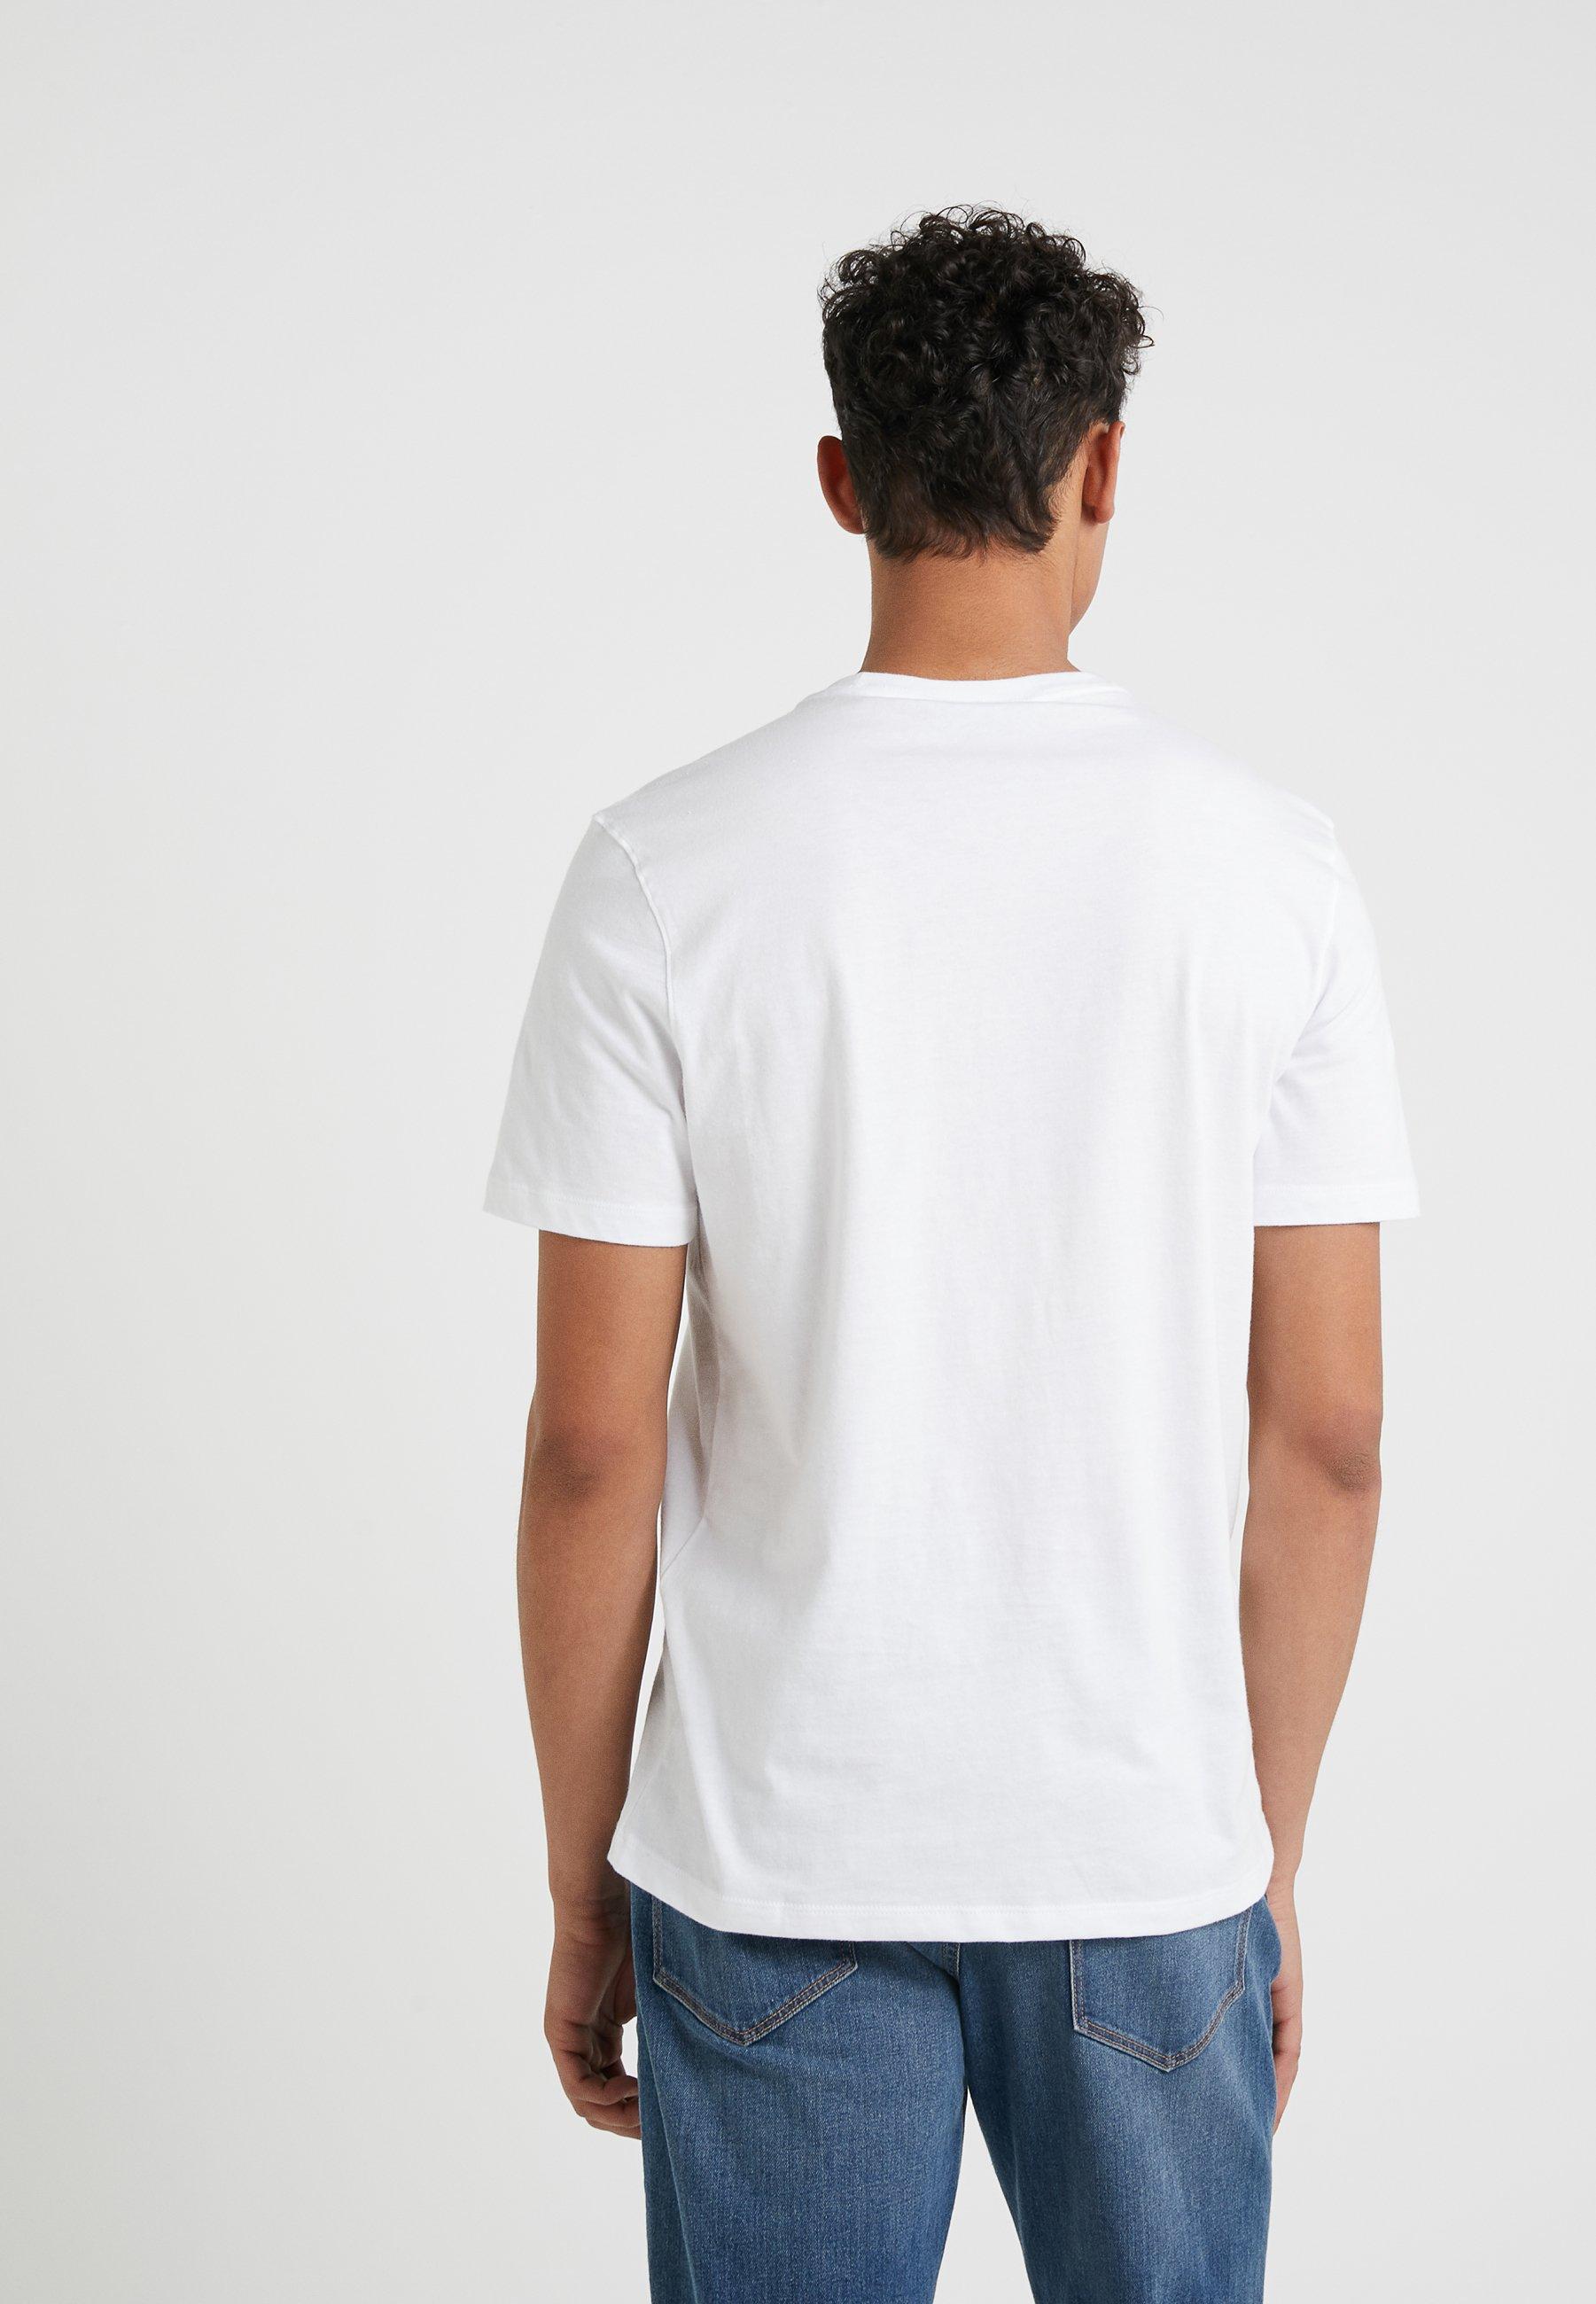 GraphicT Michael Kors Logo Crew Marker White shirt Imprimé Neck USGLVjqzpM